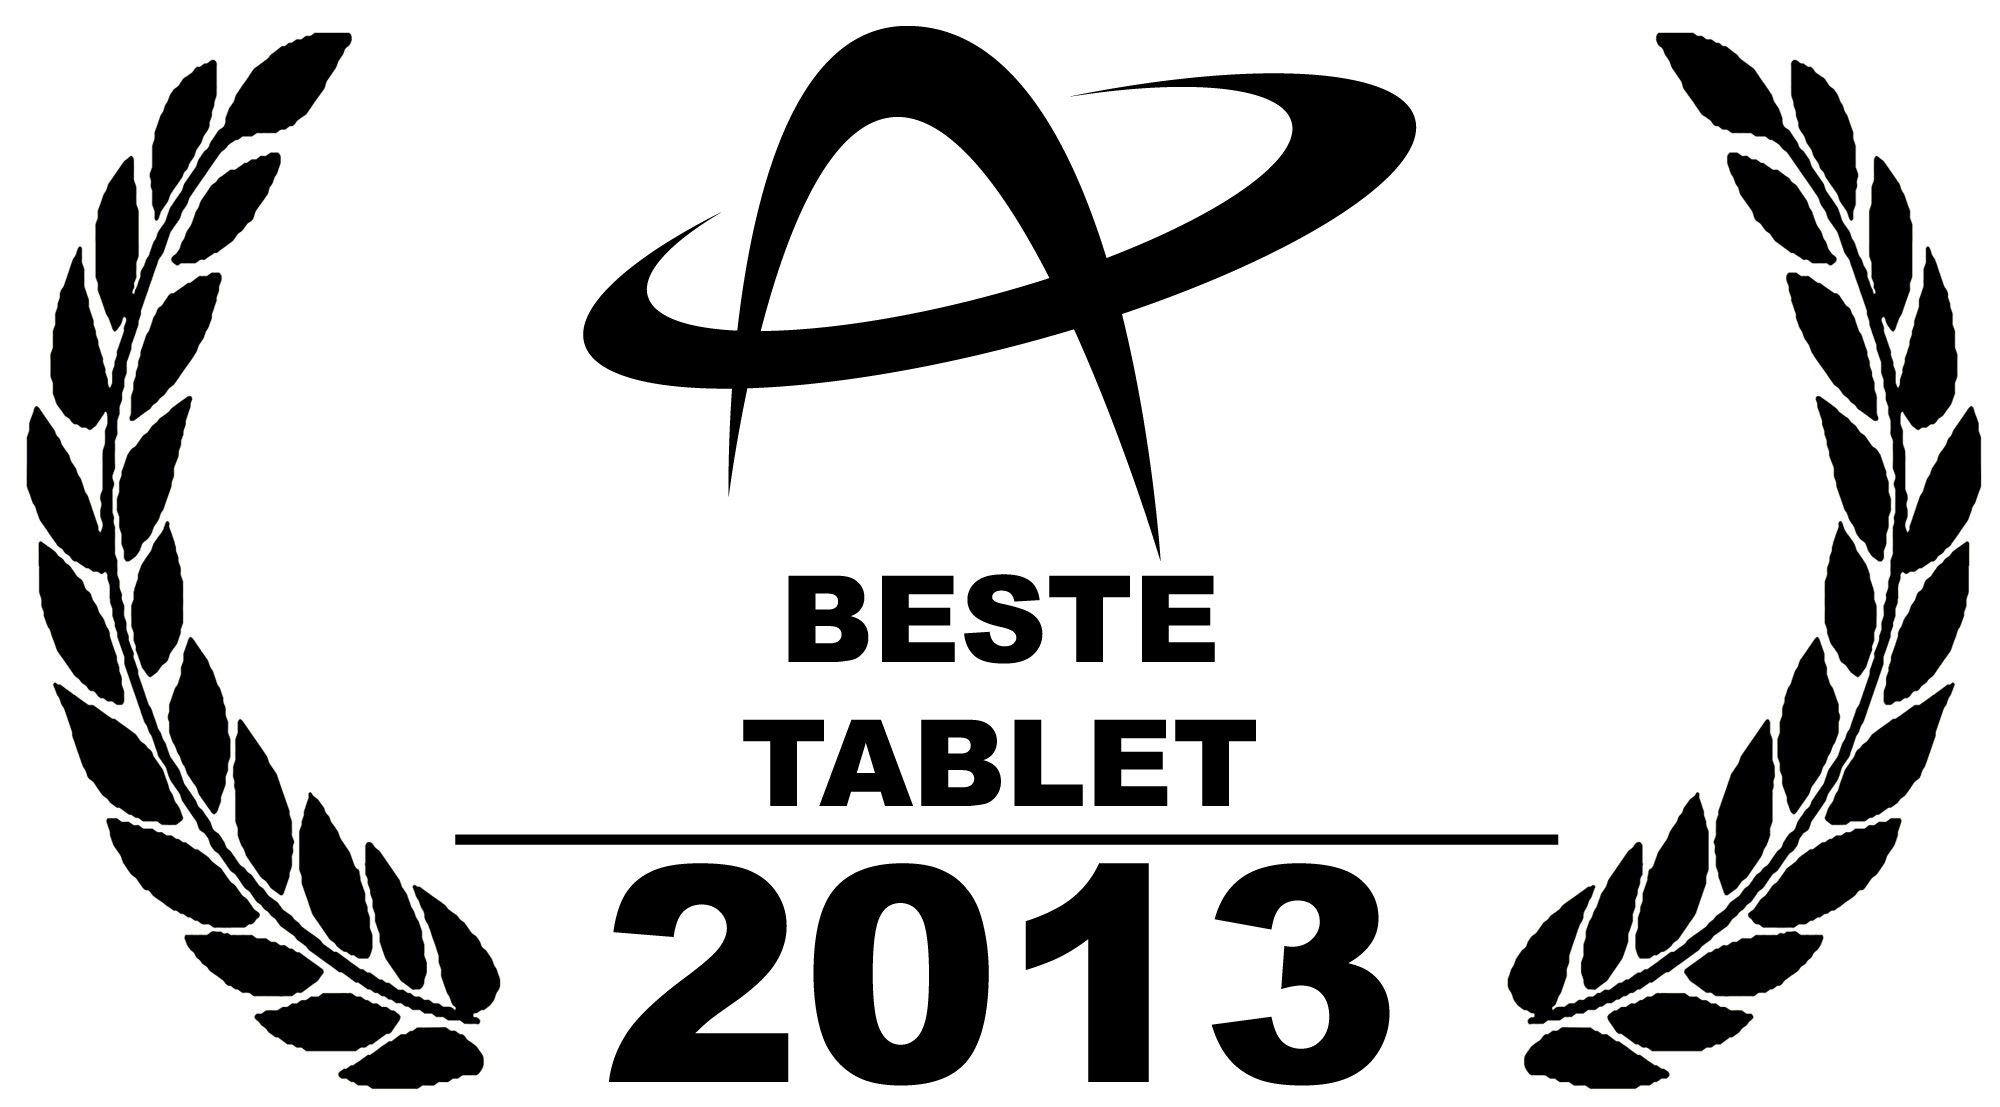 De beste tablets van 2013 (nummer 3): Asus Transformer Pad TF701